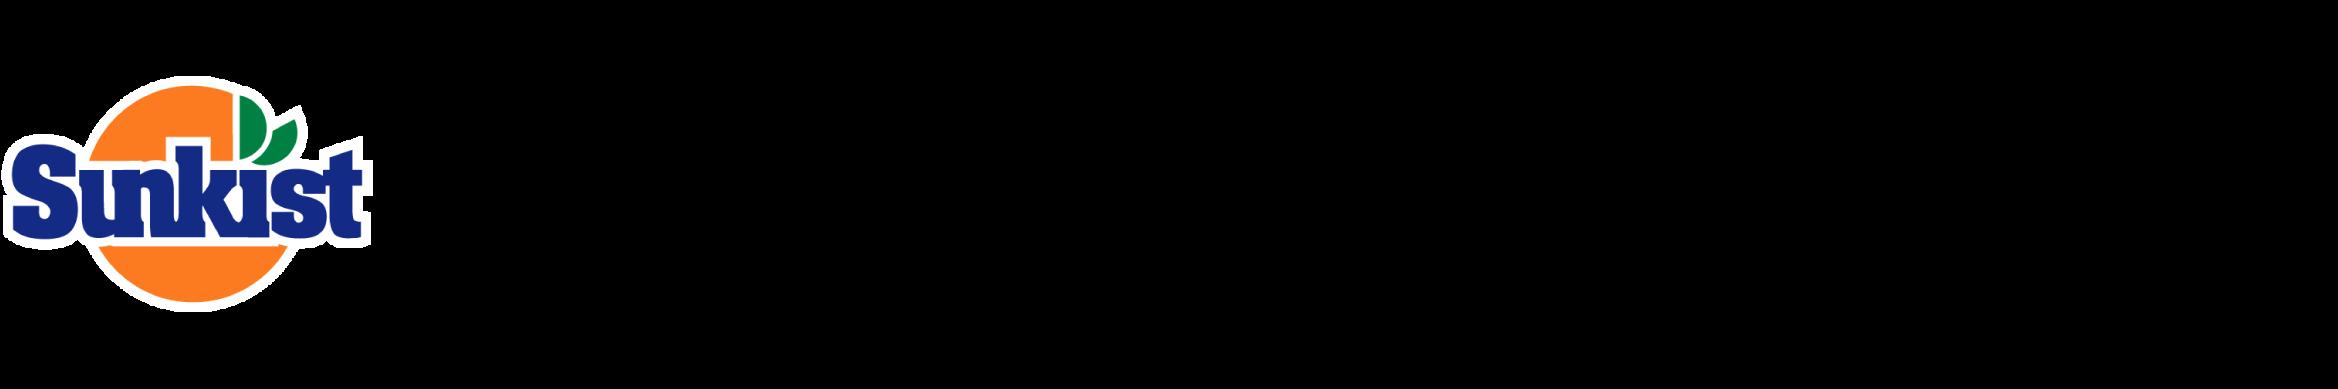 logos-images-4_poll-header-1